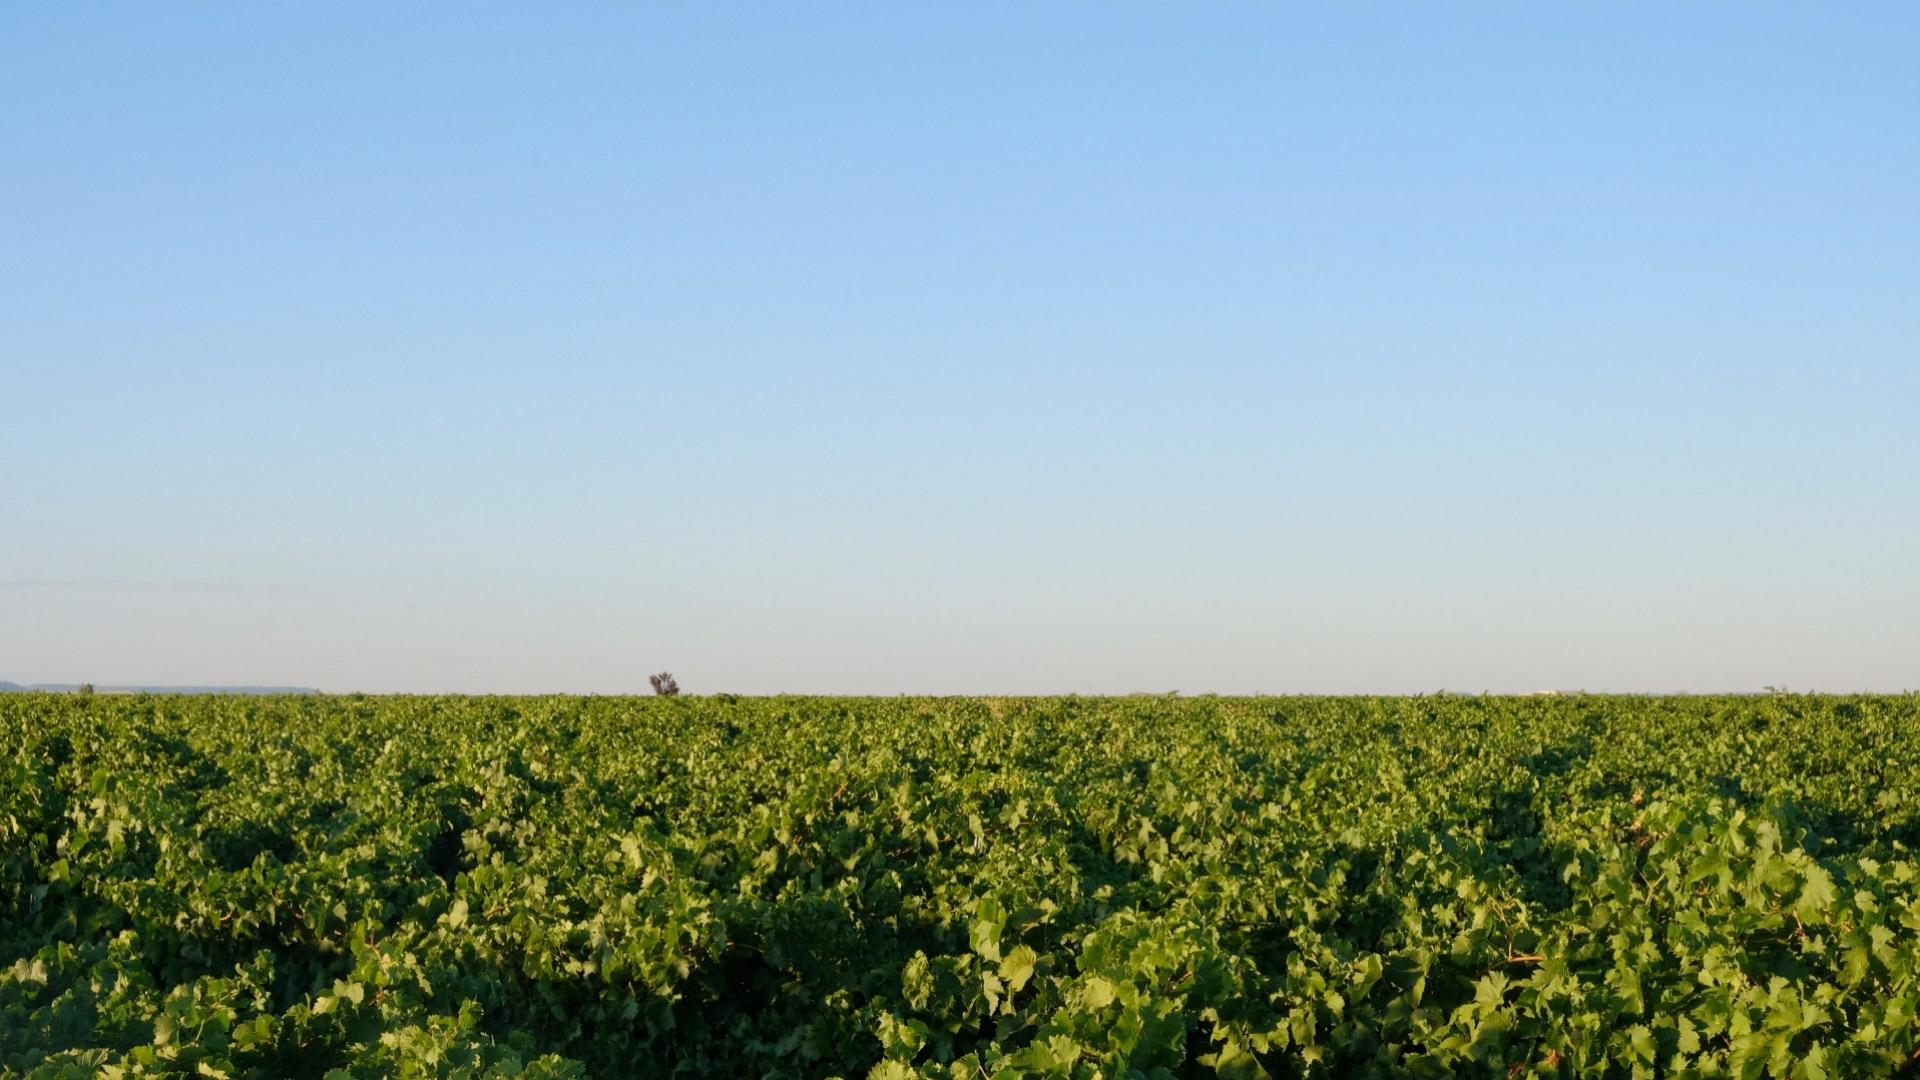 Pago de Fuente Elvira: a 'vineyard of vineyards' steeped in history